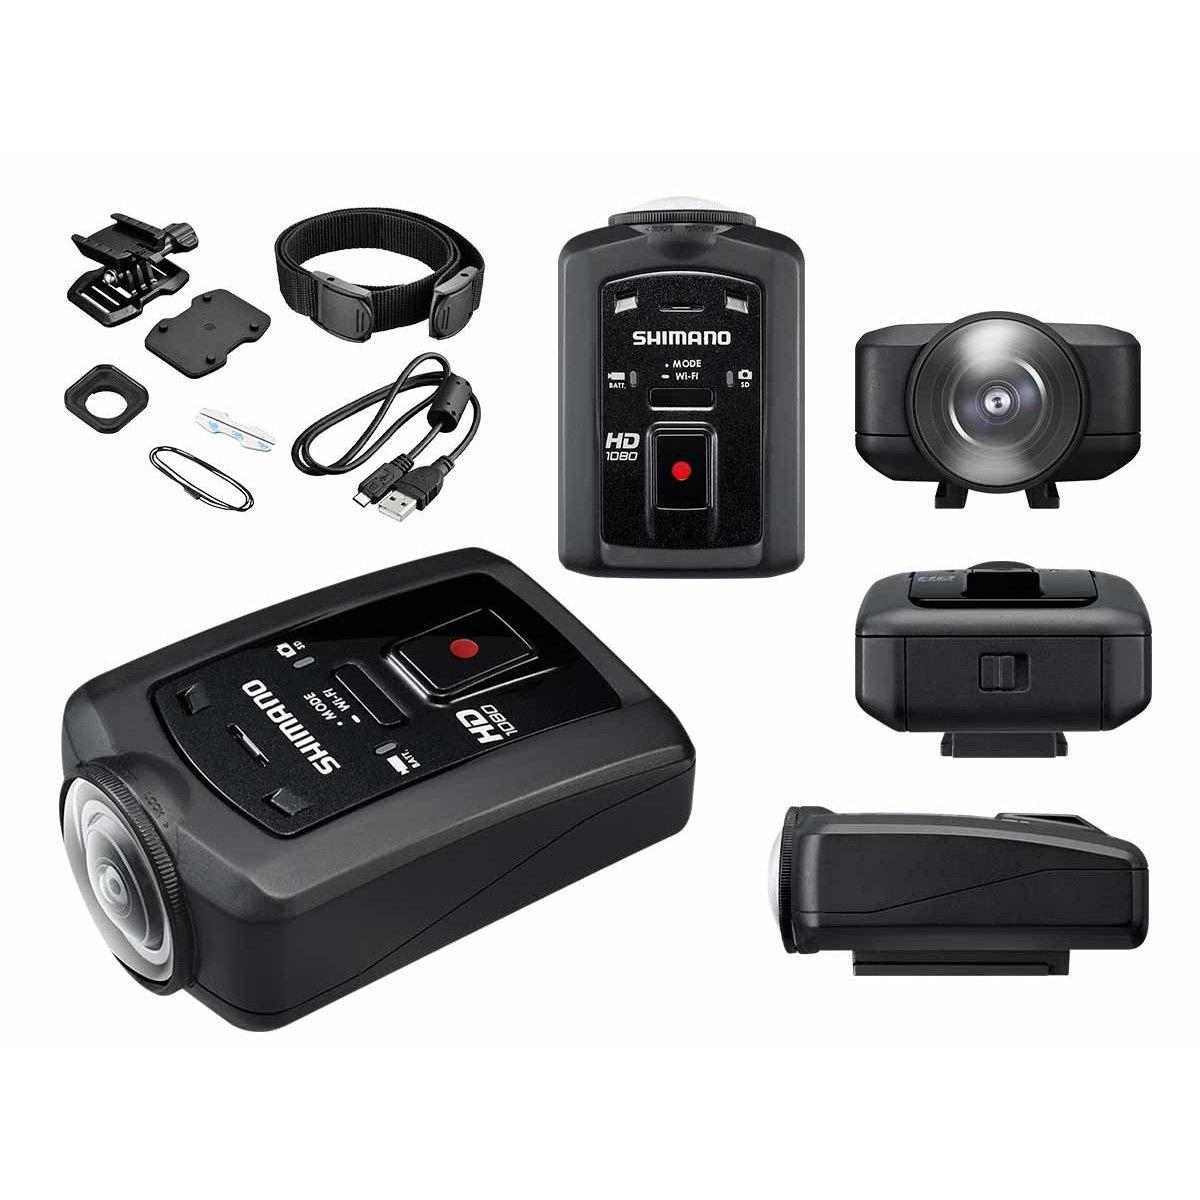 Shimano CM-1000 HD 1080p Sports Camera $87 Shipped